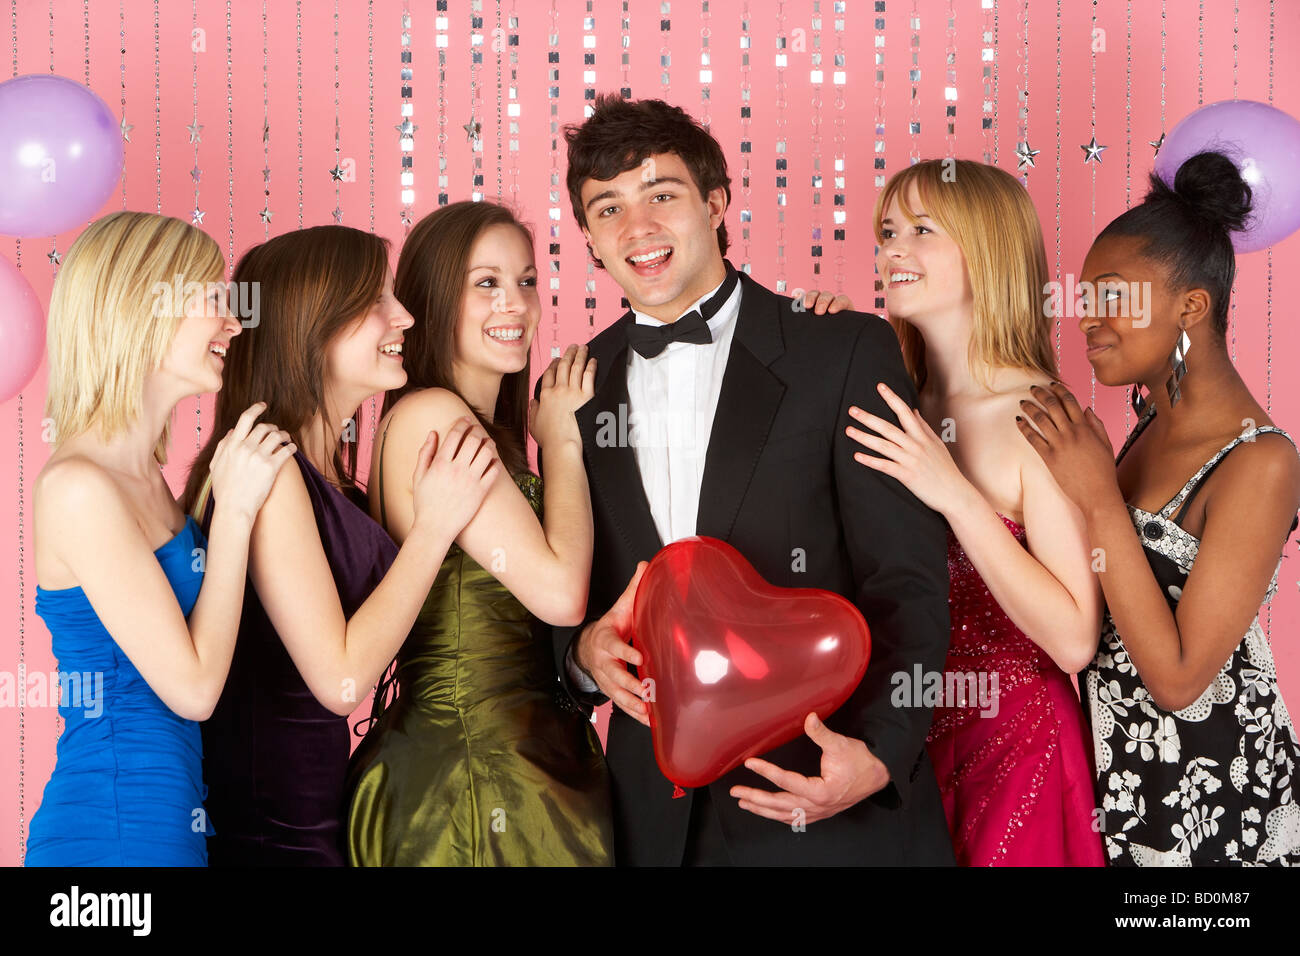 Teenage Girls Looking At Attractive Boy - Stock Image